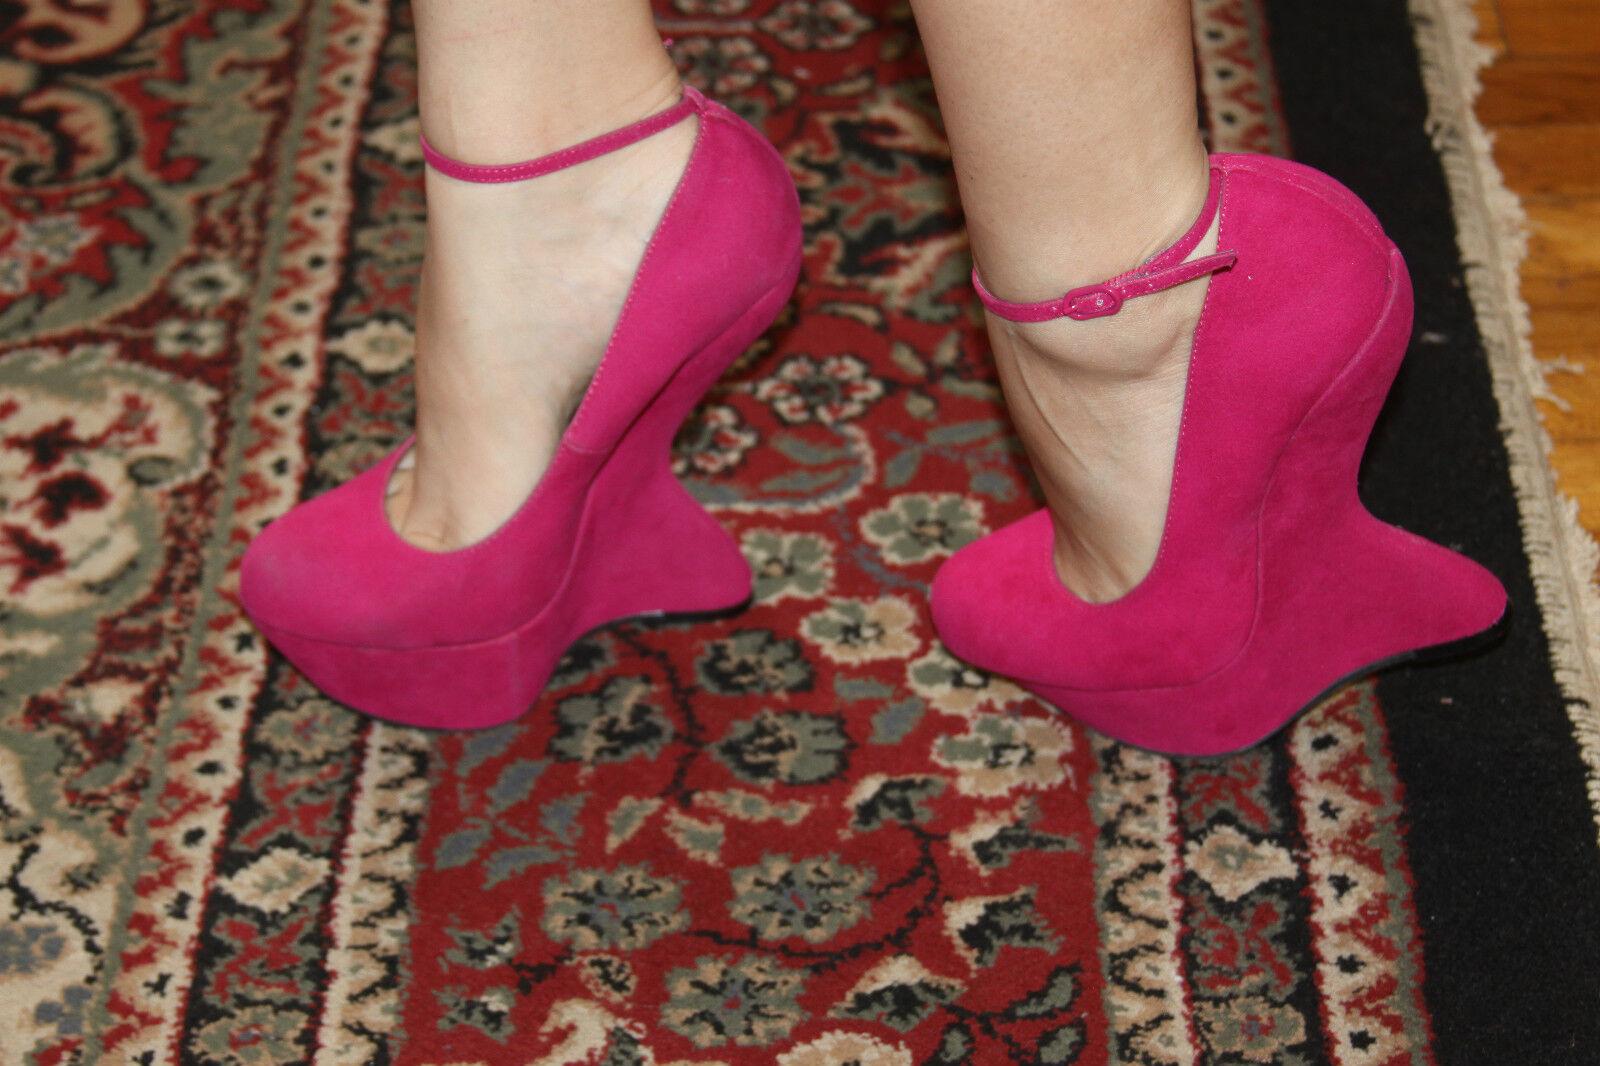 Steve Madden Gravityy-Plataforma rosado rosado rosado Tamaño 7.5M  salida